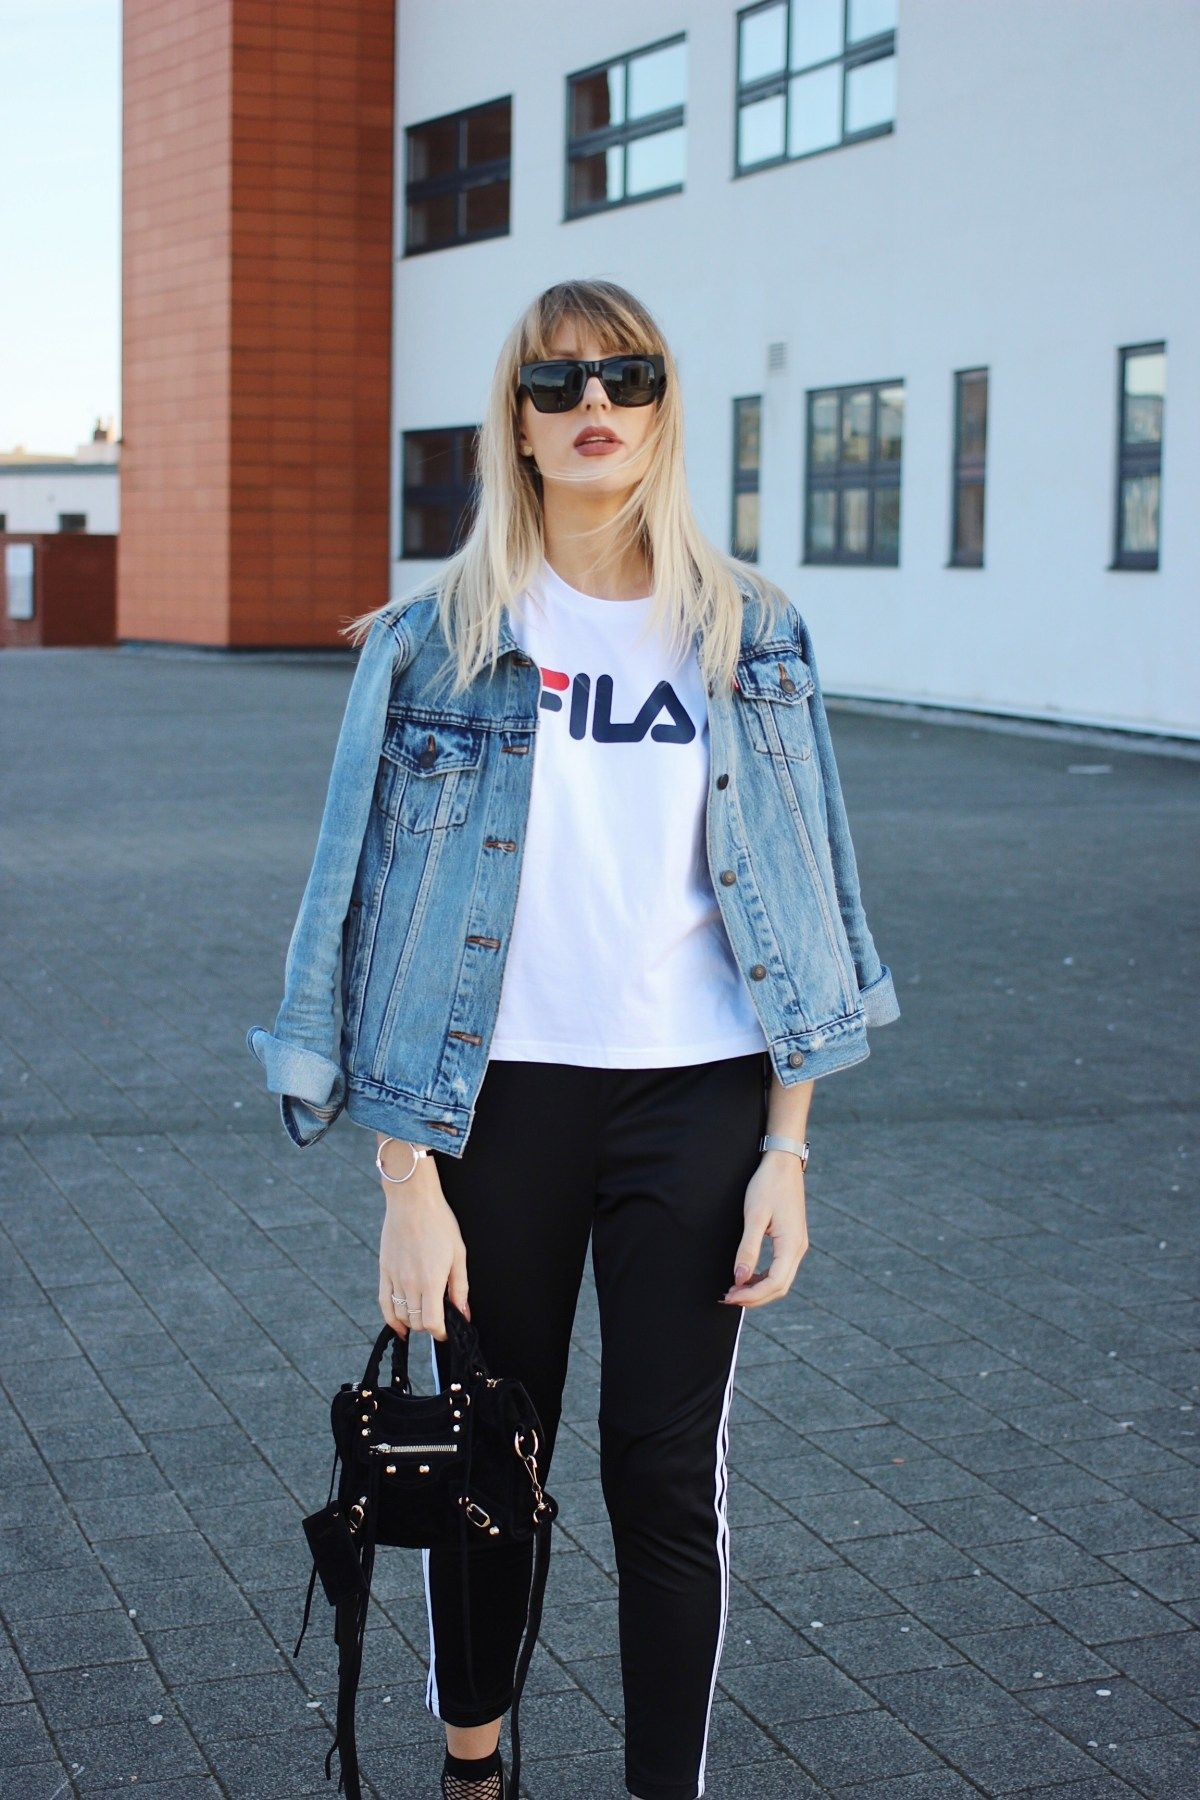 9f6cb91de8b8 styling the logo t-shirt trend street style - Fila tee, Balenciaga Bag,  Saint Laurent Sunglasses and Levi Denim Jacket Outfit inspiration